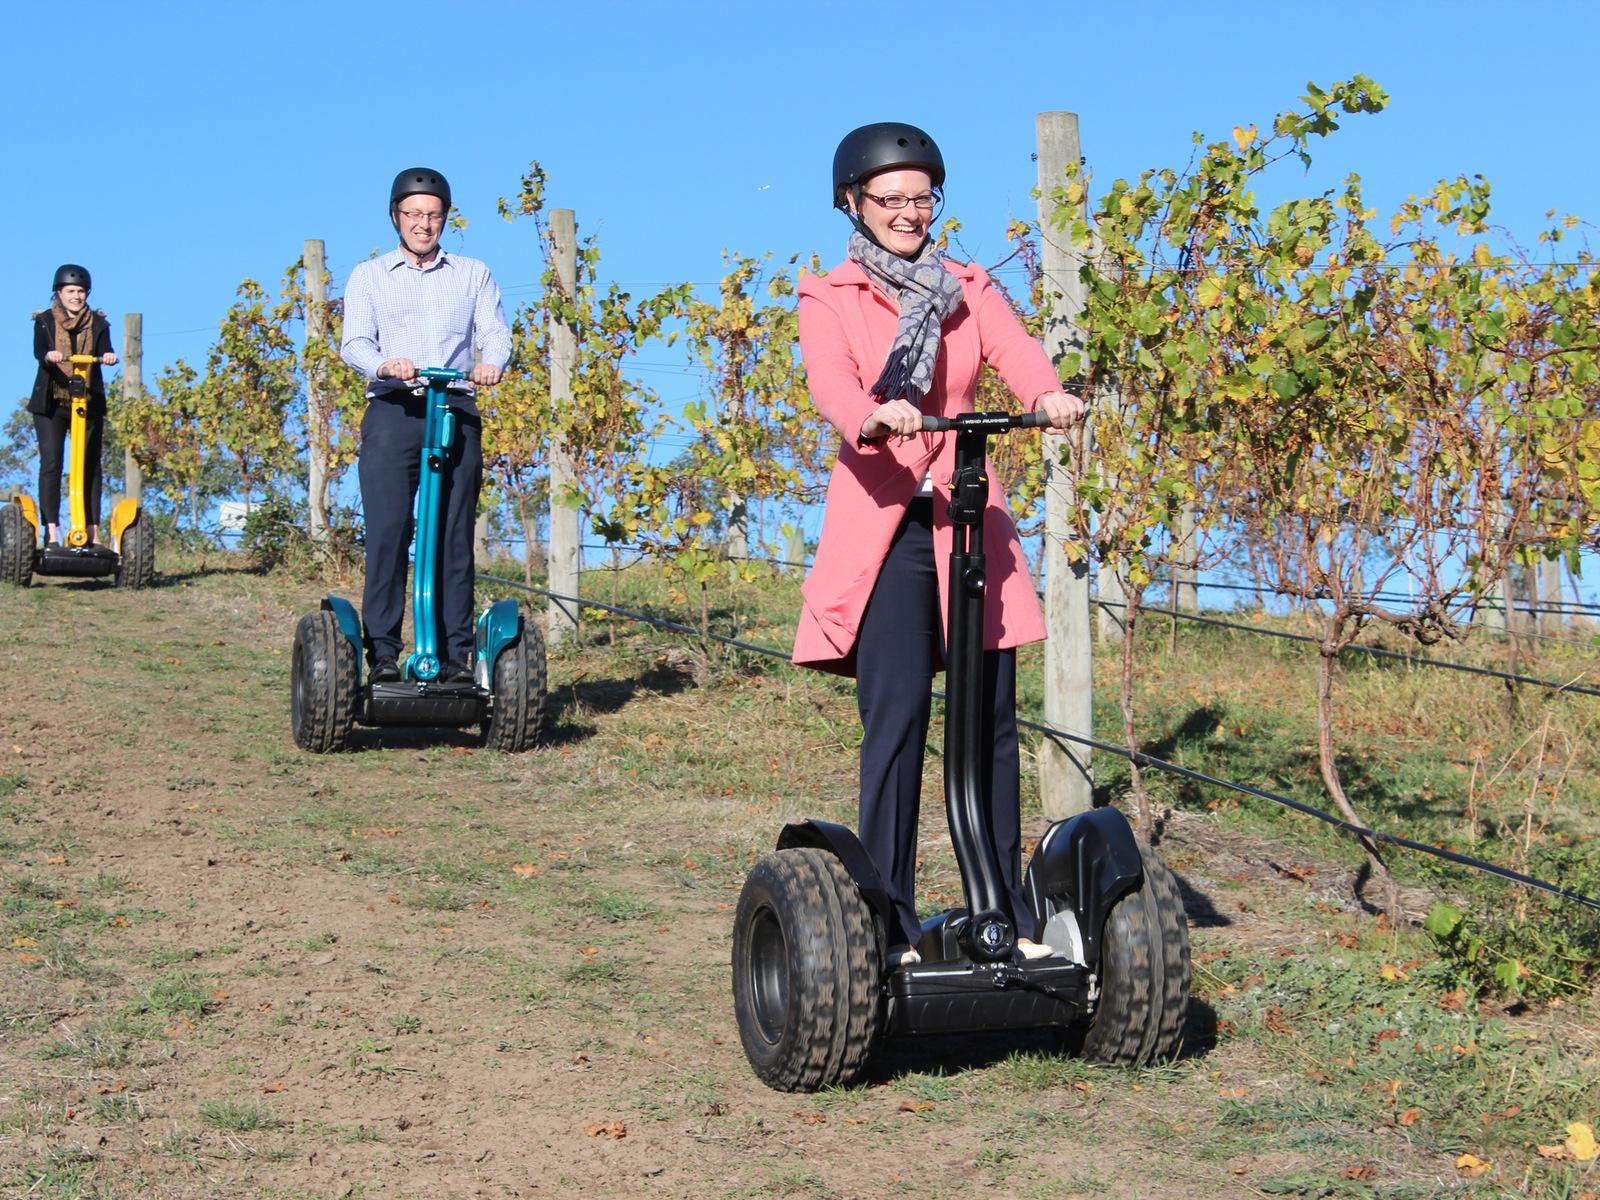 Vineyard Segway Tour at Cleveland Winery, Macedon Ranges